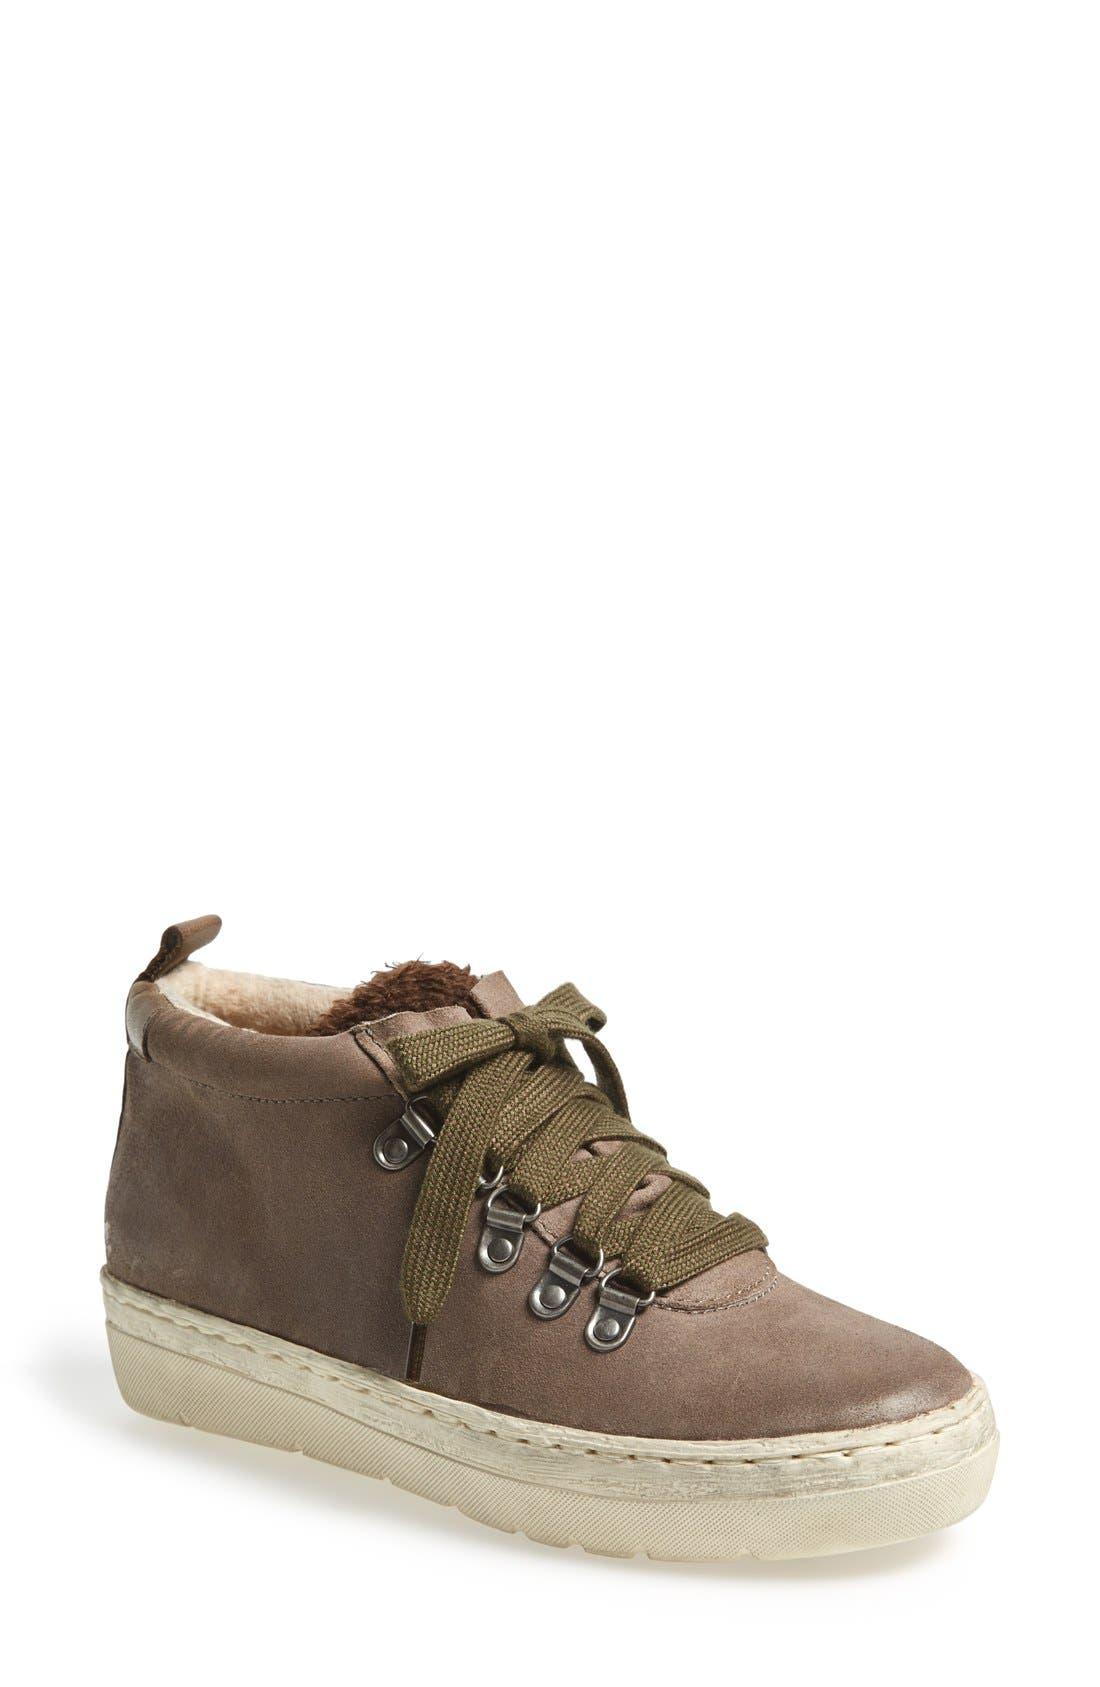 Women's OTBT Shoes Sale \u0026 Clearance